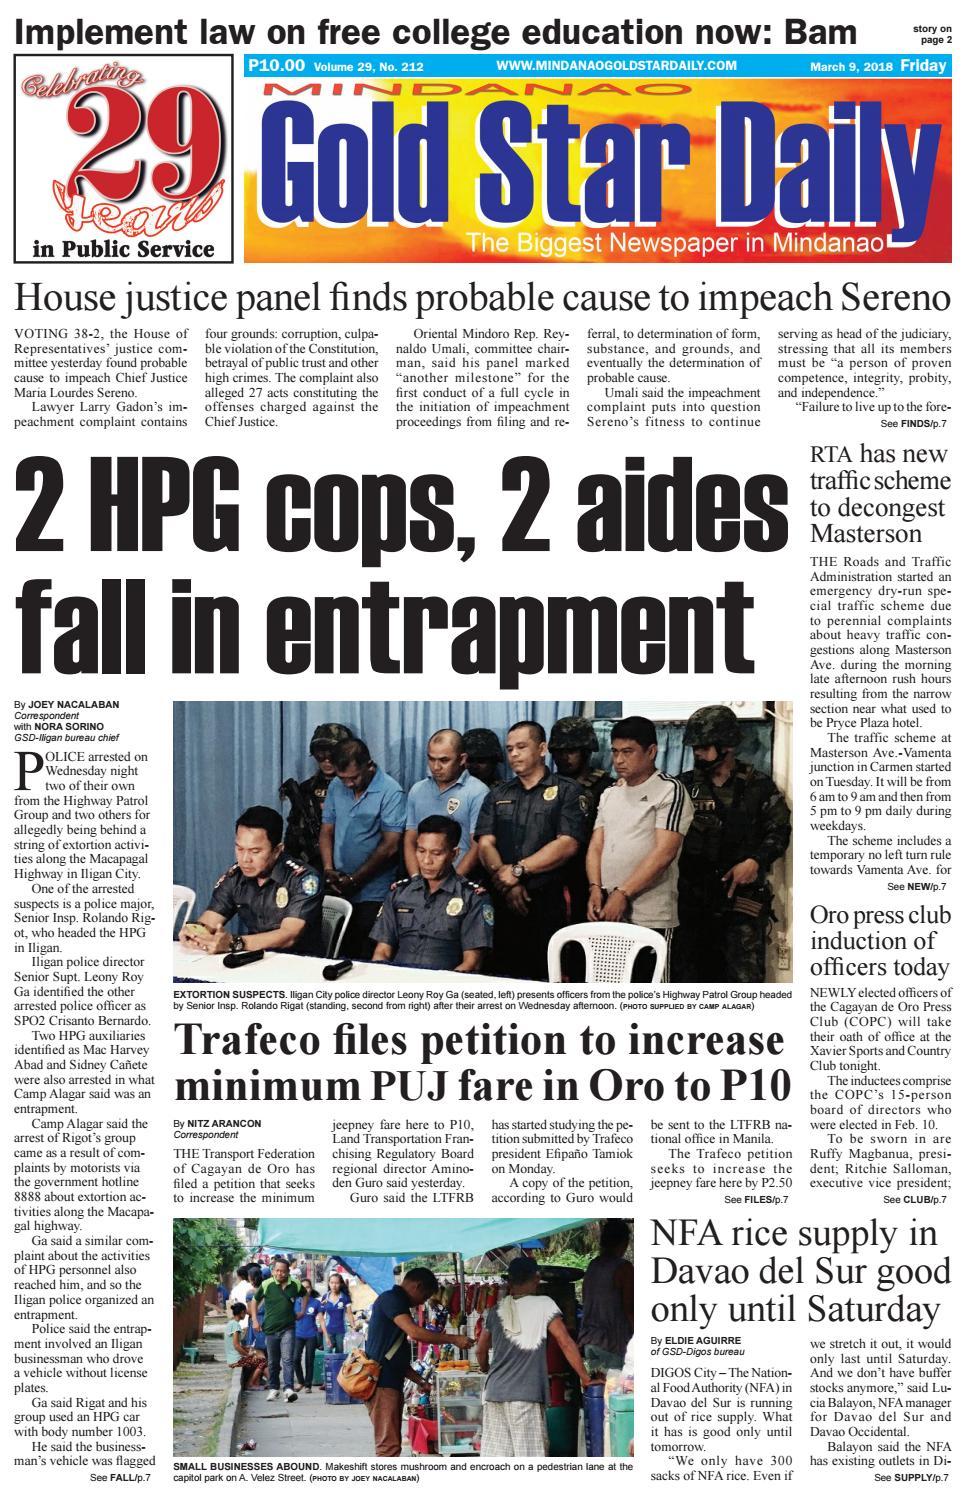 Mgsd 3-9-18 by Mindanao Gold Star Daily - issuu